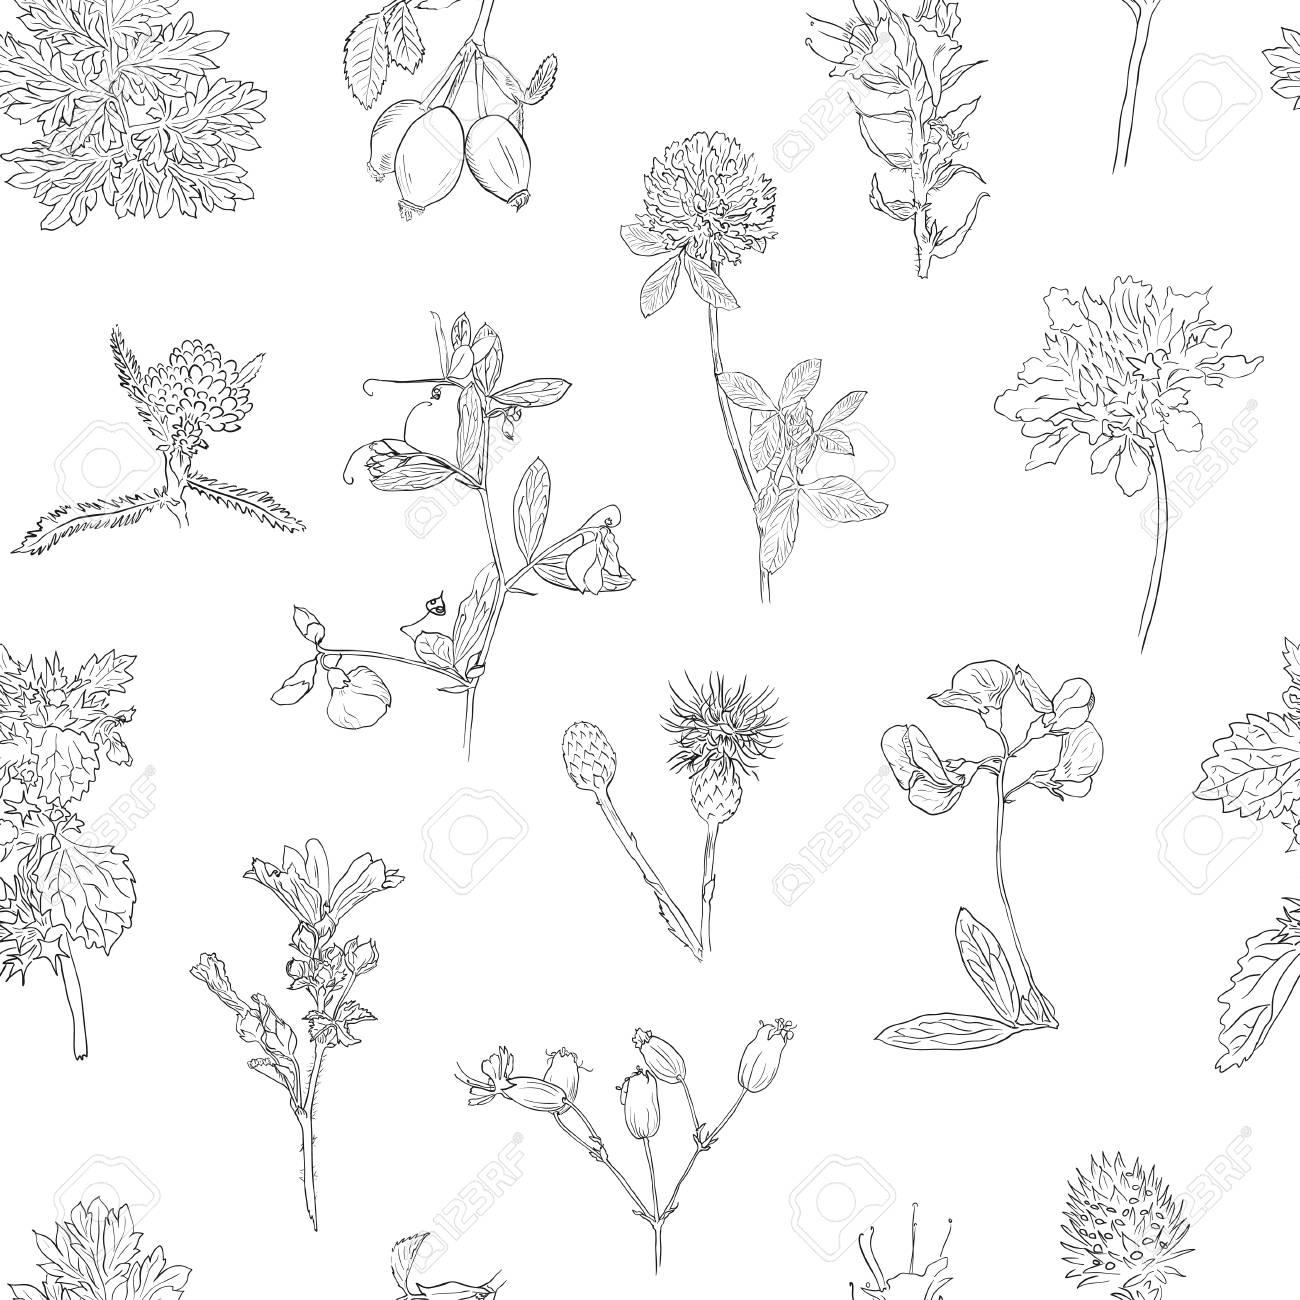 Wildflowers and berries seamless pattern  Dogrose, burdock, herbs